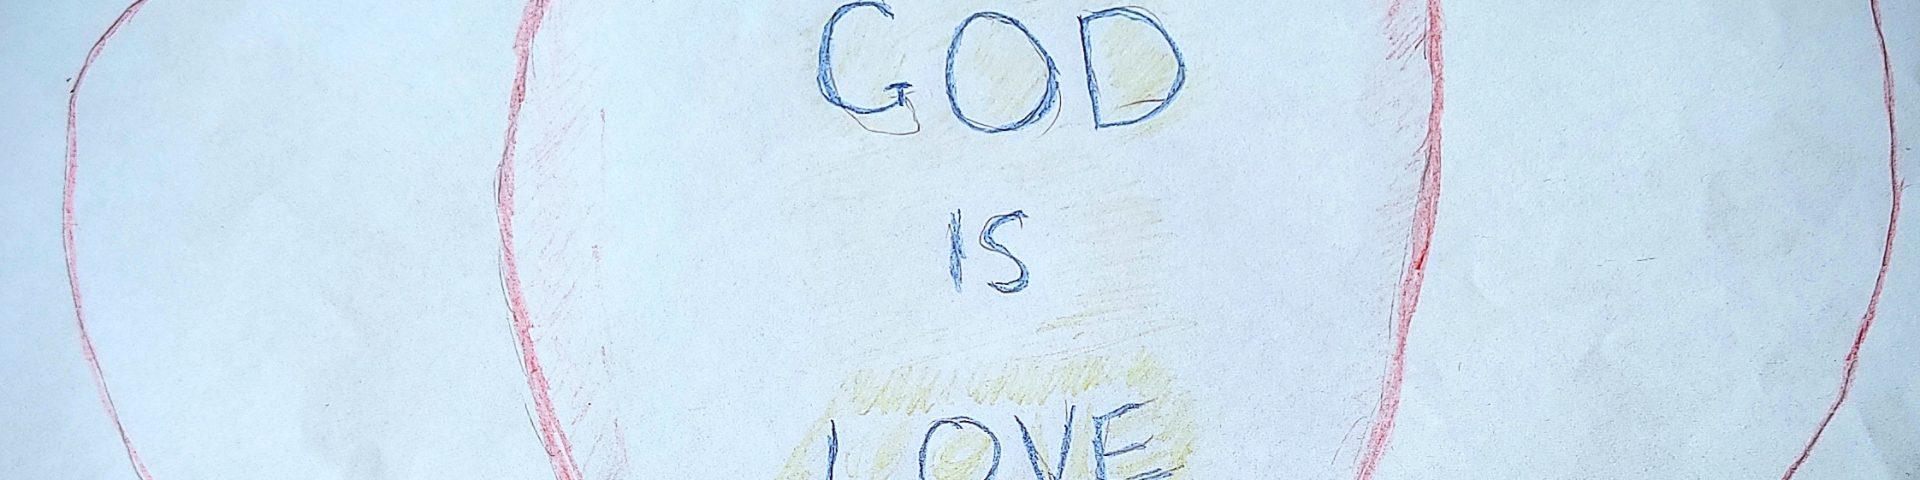 An image of God